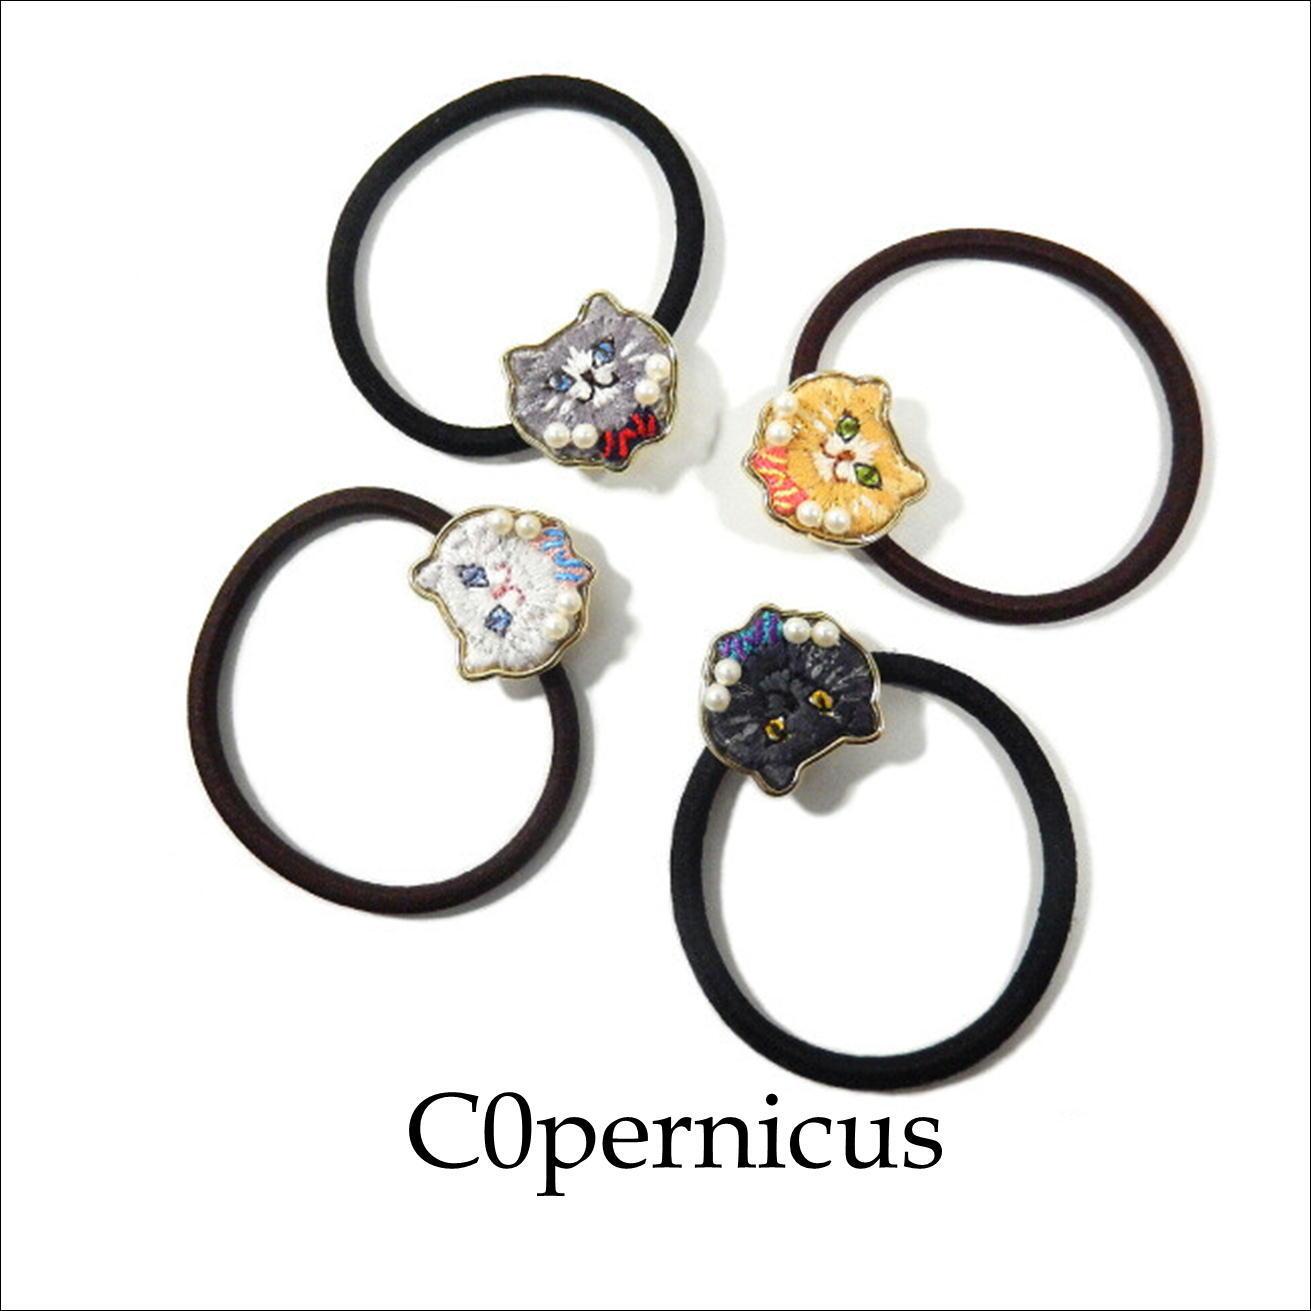 4color ネコポニー 猫ヘアアクセ ネコ雑貨/浜松雑貨屋C0pernicus